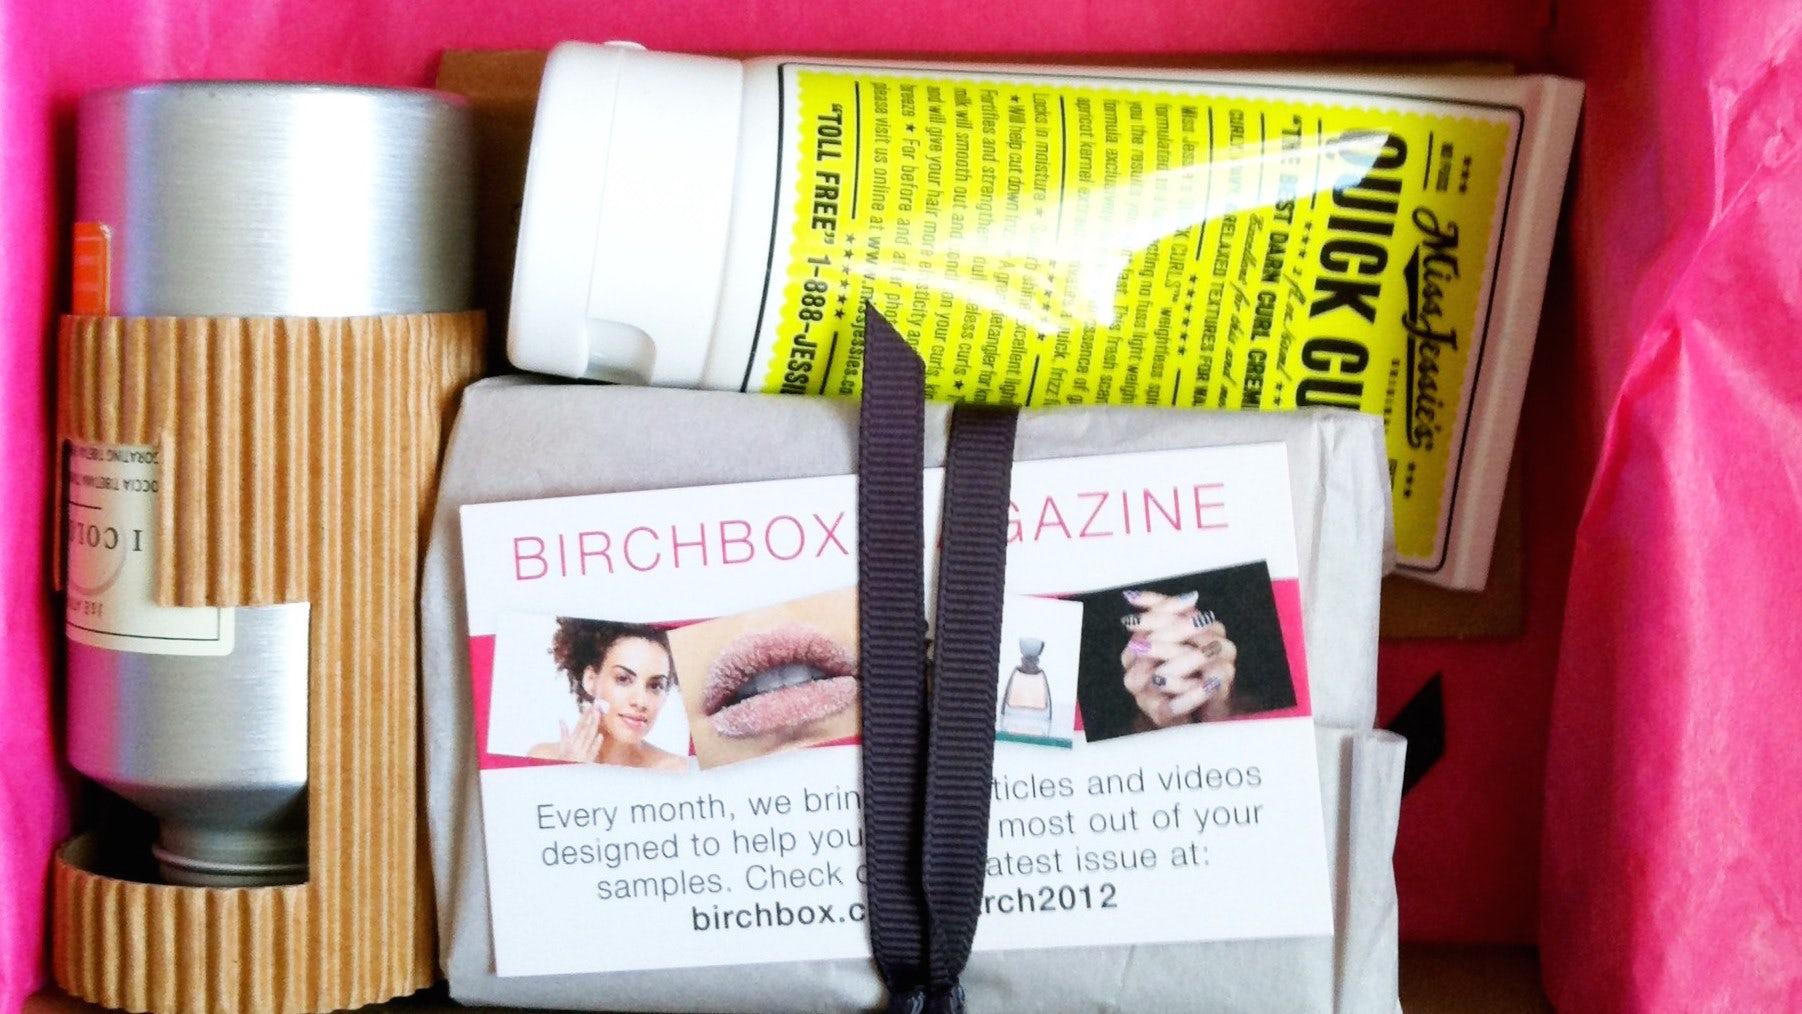 Birchbox | Source: Flickr/Jenny